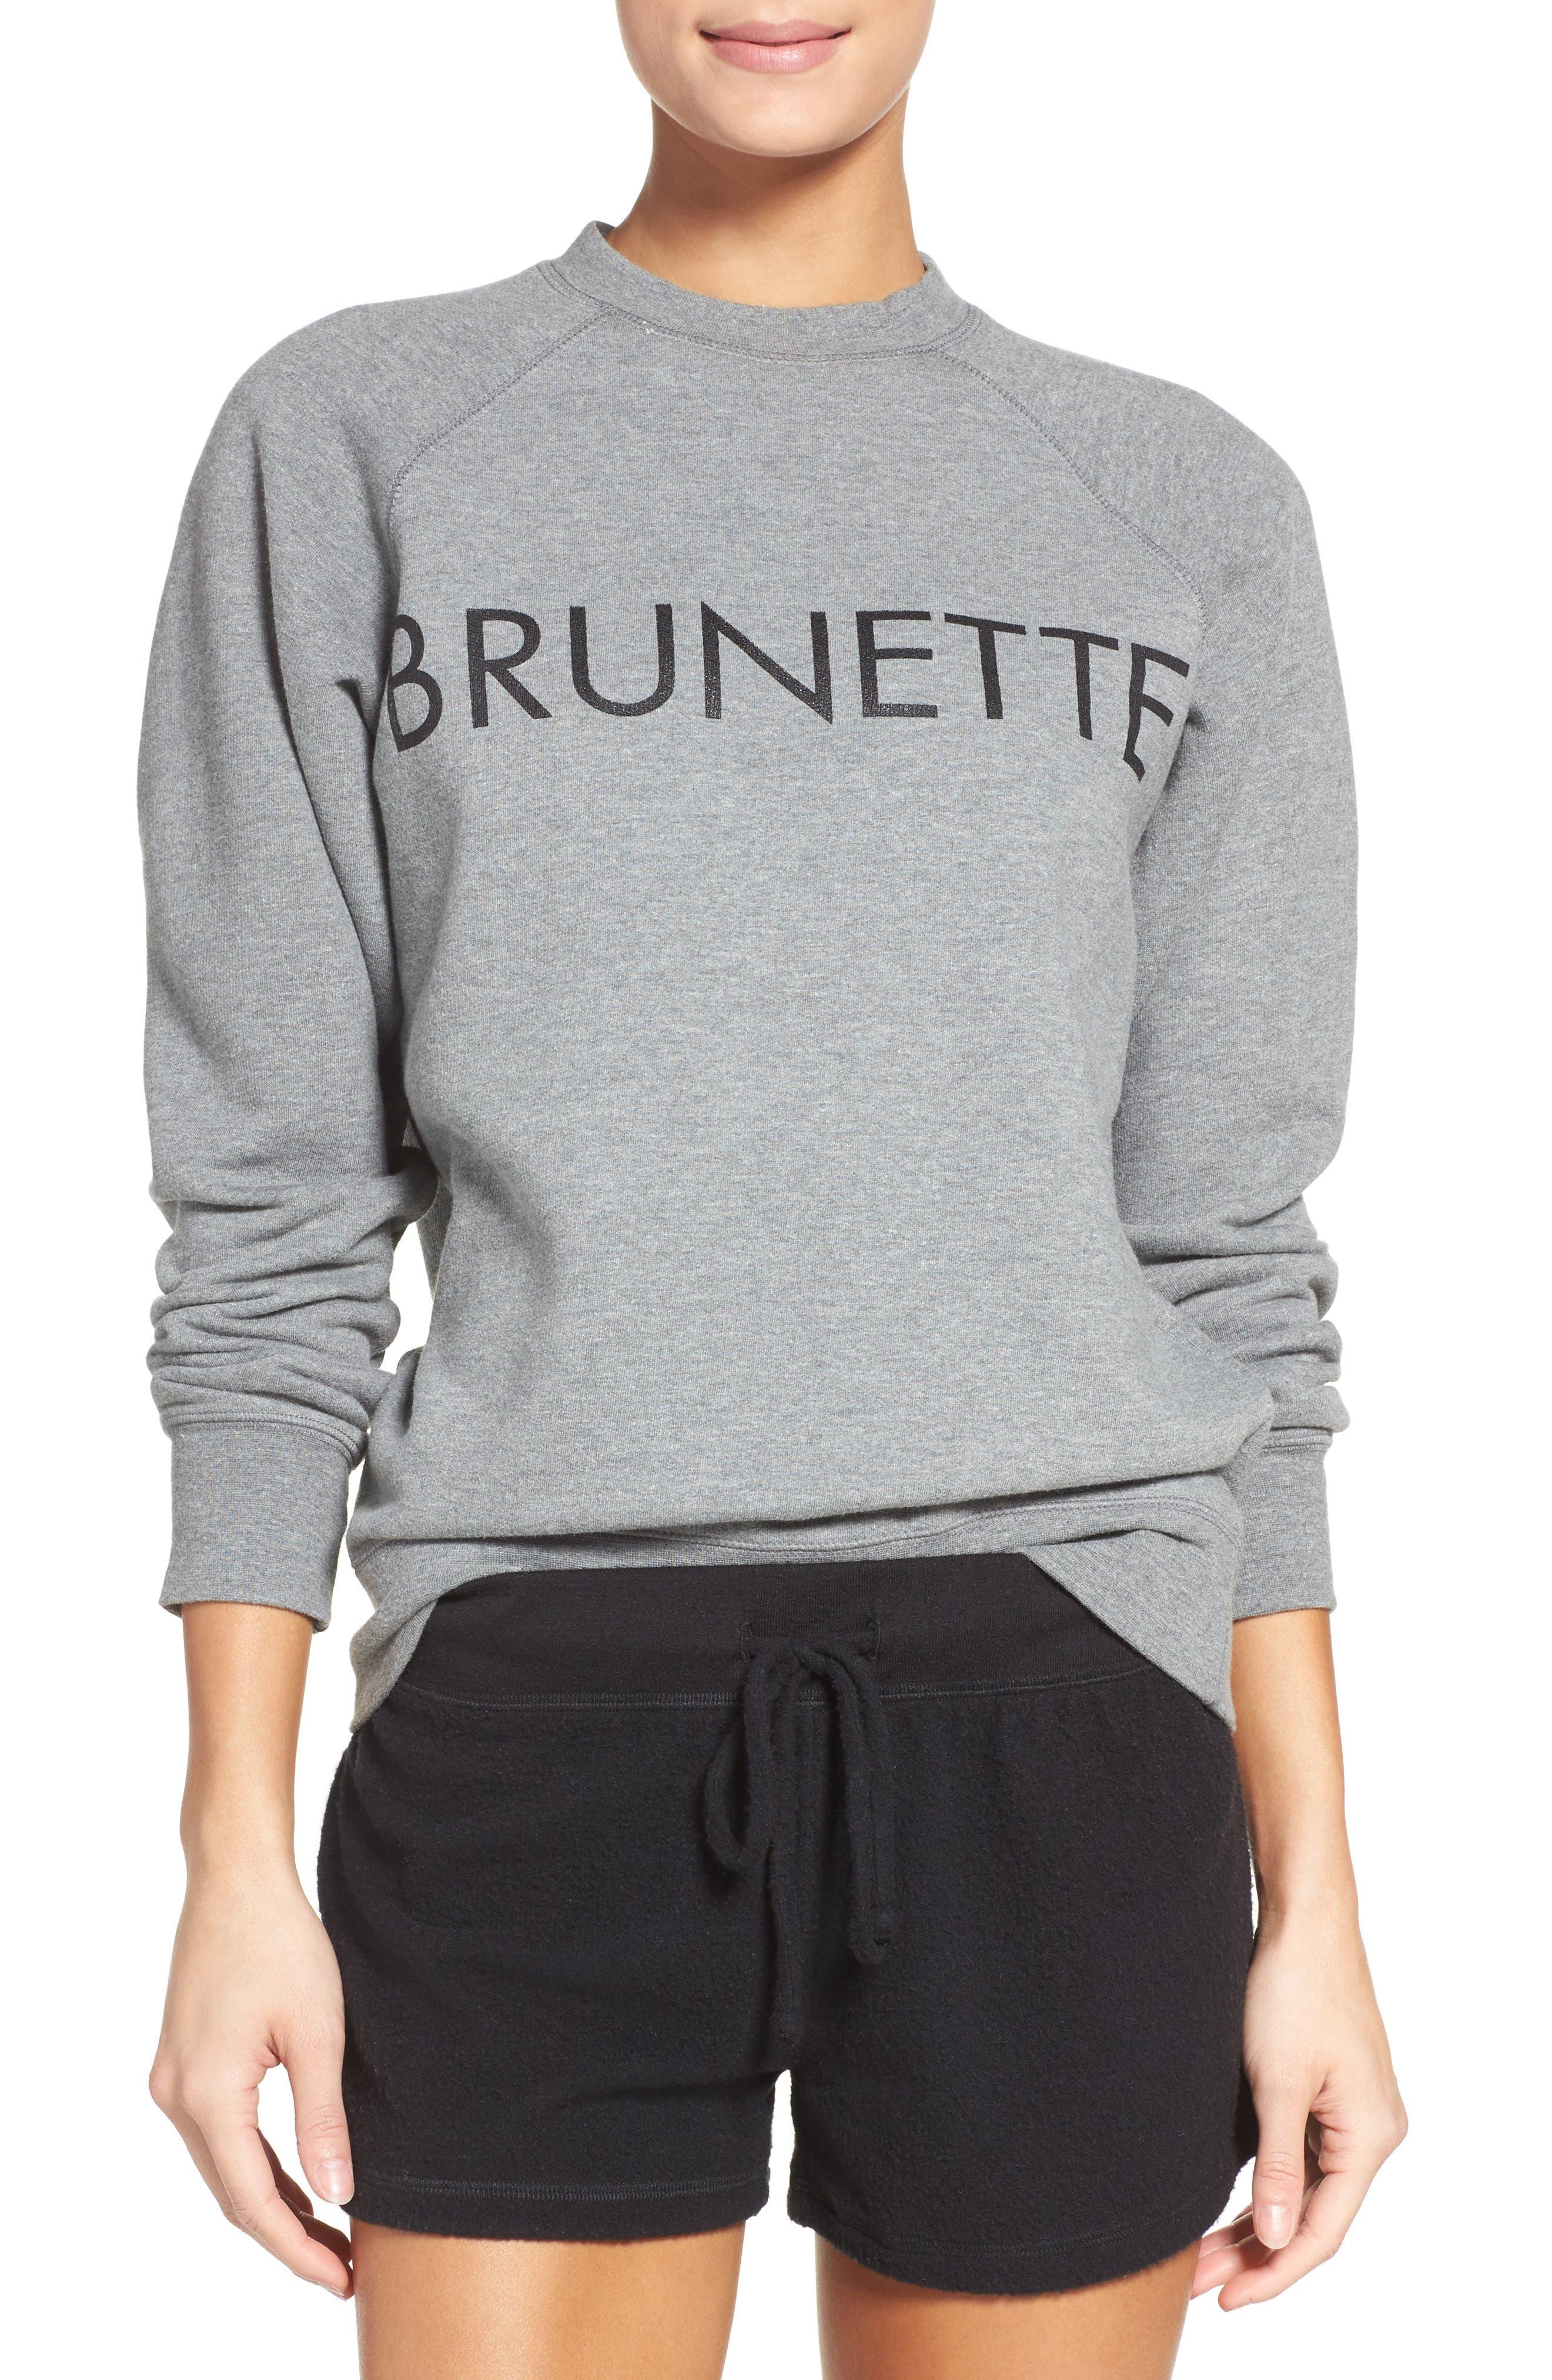 Brunette Crewneck Sweatshirt,                         Main,                         color, Grey